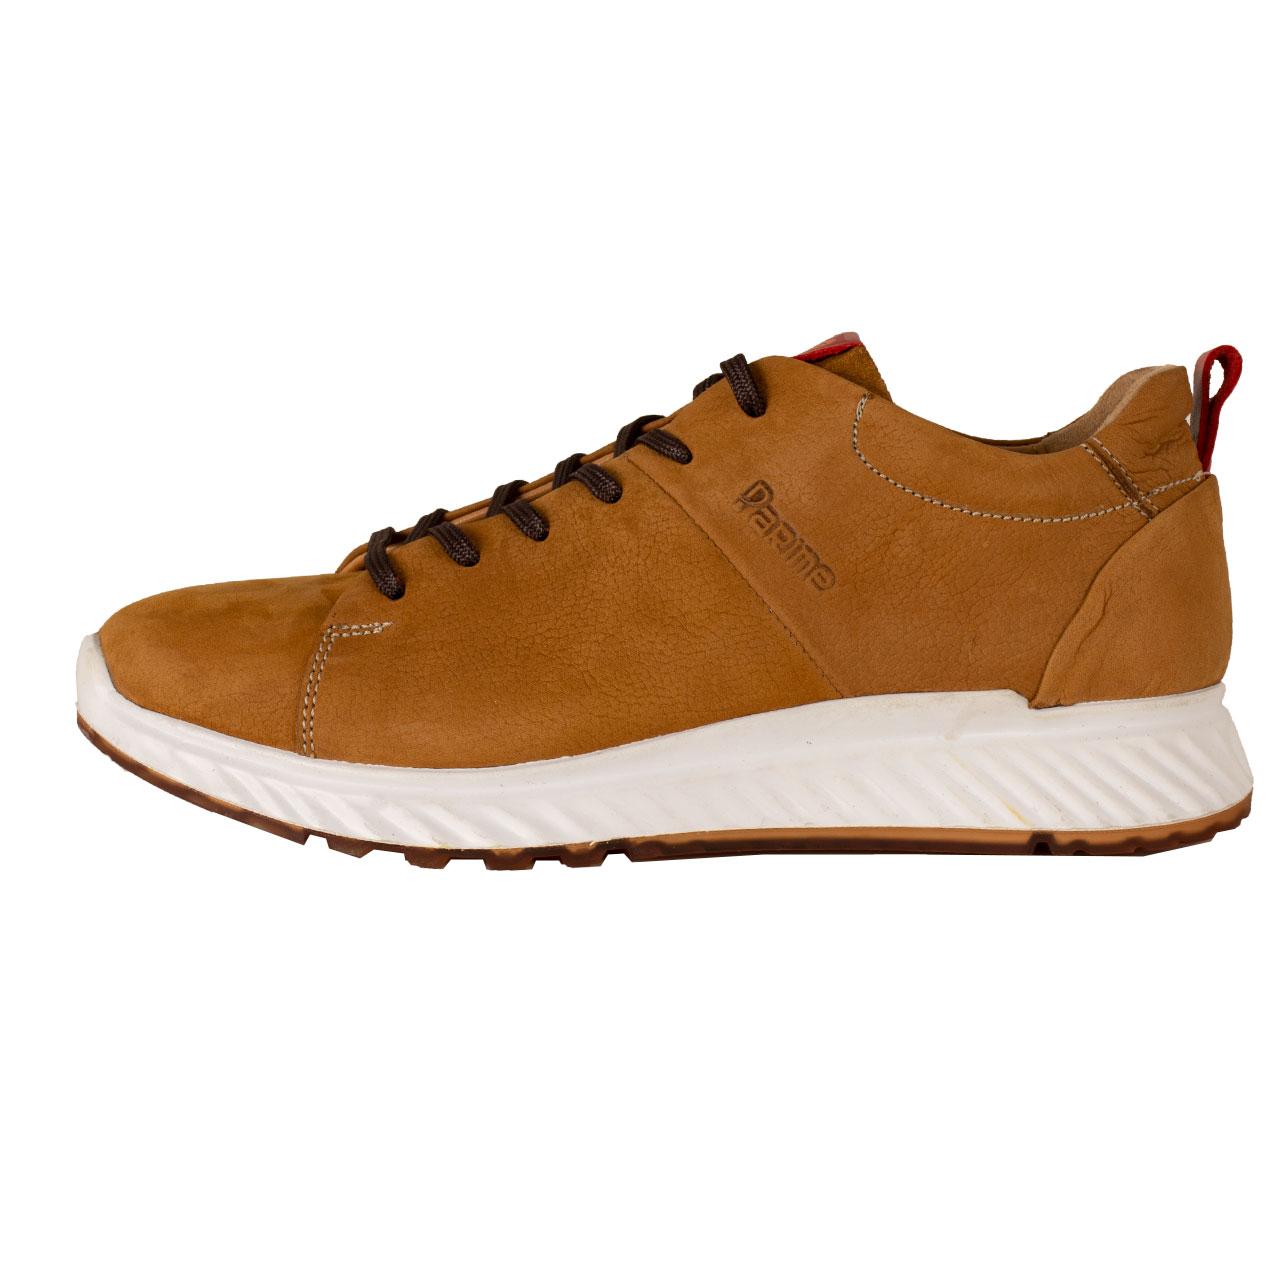 PARINECHARM men's daily shoes , SHO217-1  Model